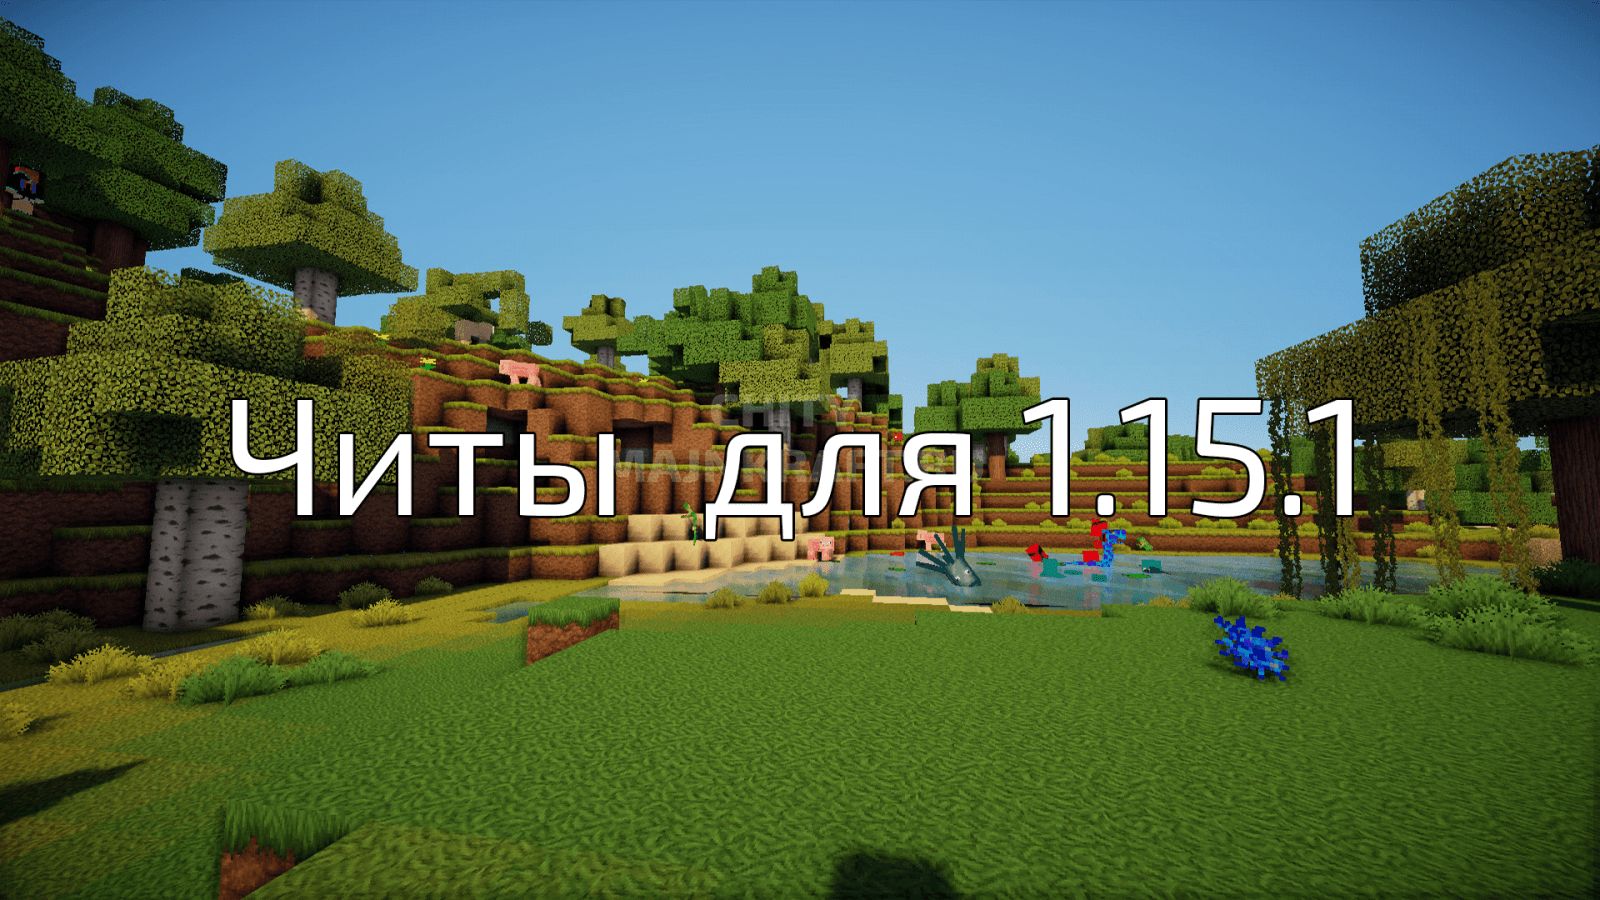 Читы для Майнкрафт 1.15.1